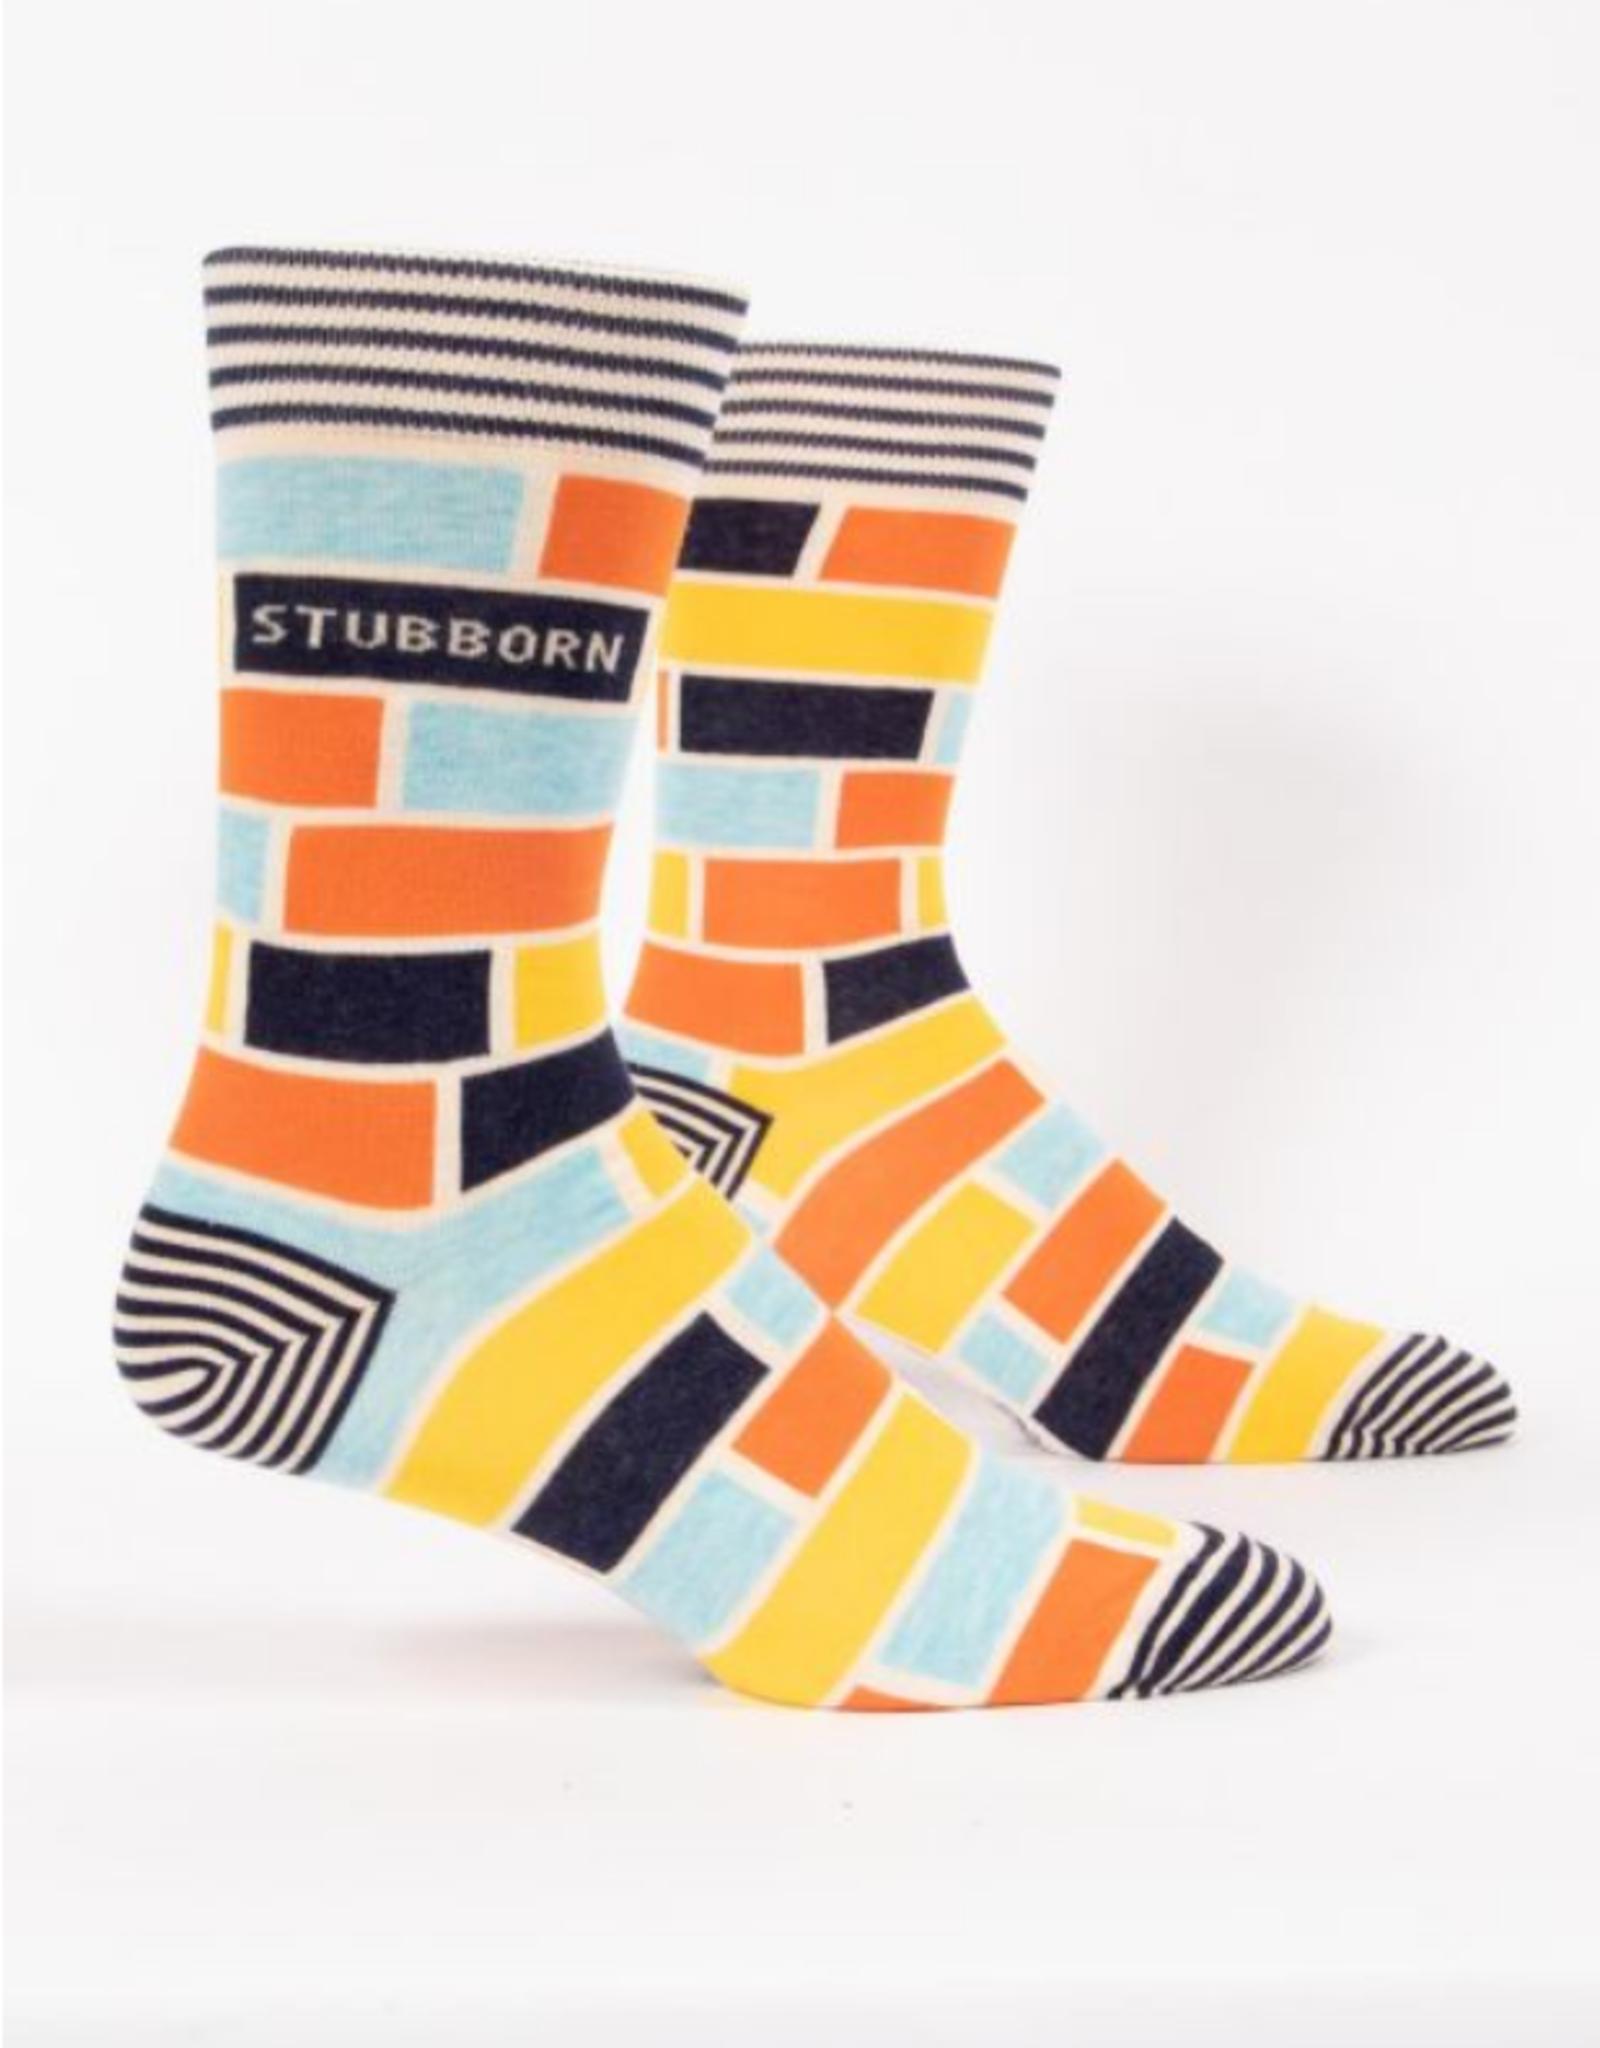 Stubborn Men's Crew Socks